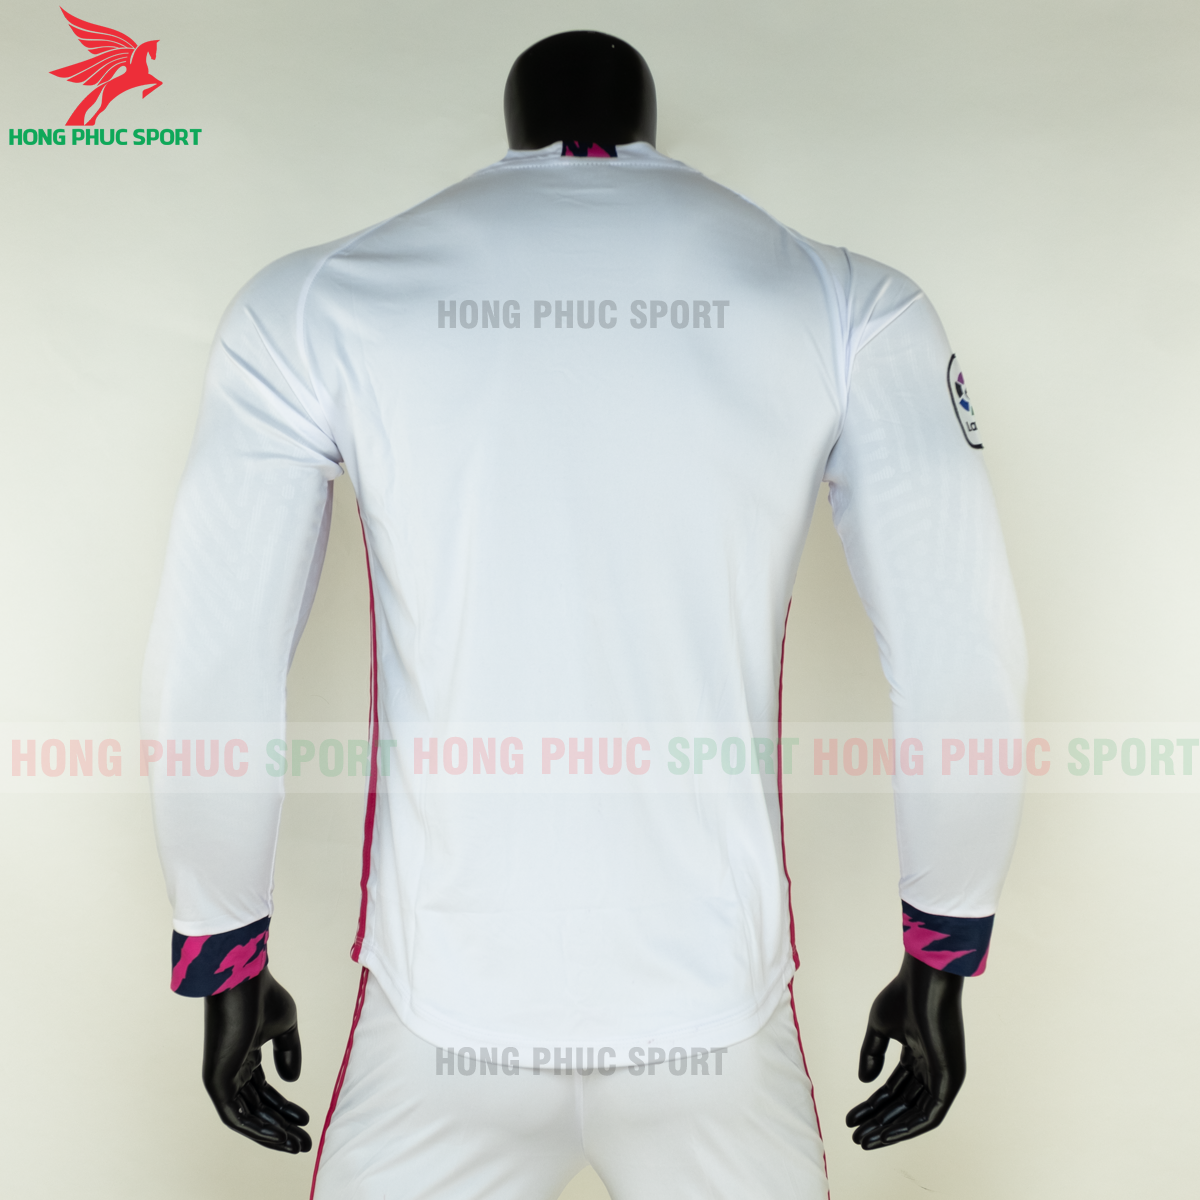 https://cdn.hongphucsport.com/unsafe/s4.shopbay.vn/files/285/ao-dai-tay-real-madrid-2020-san-nha-8-5f8fe2fd4c945.png